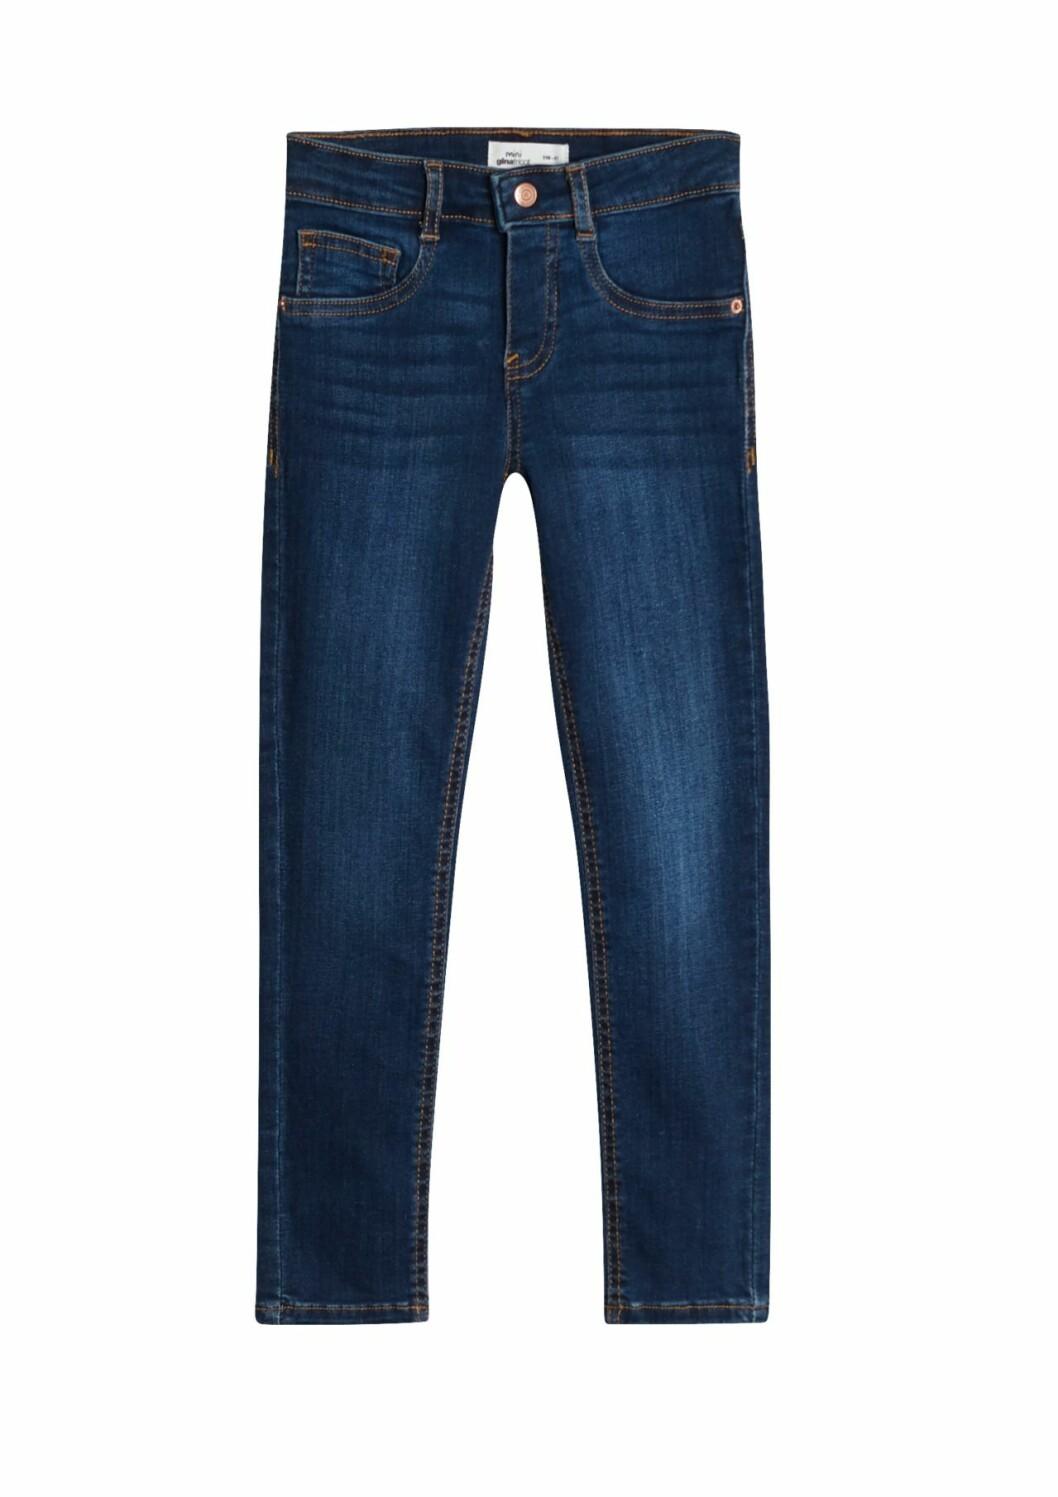 Gina tricot Mini mor- och barnkollektion –jeans